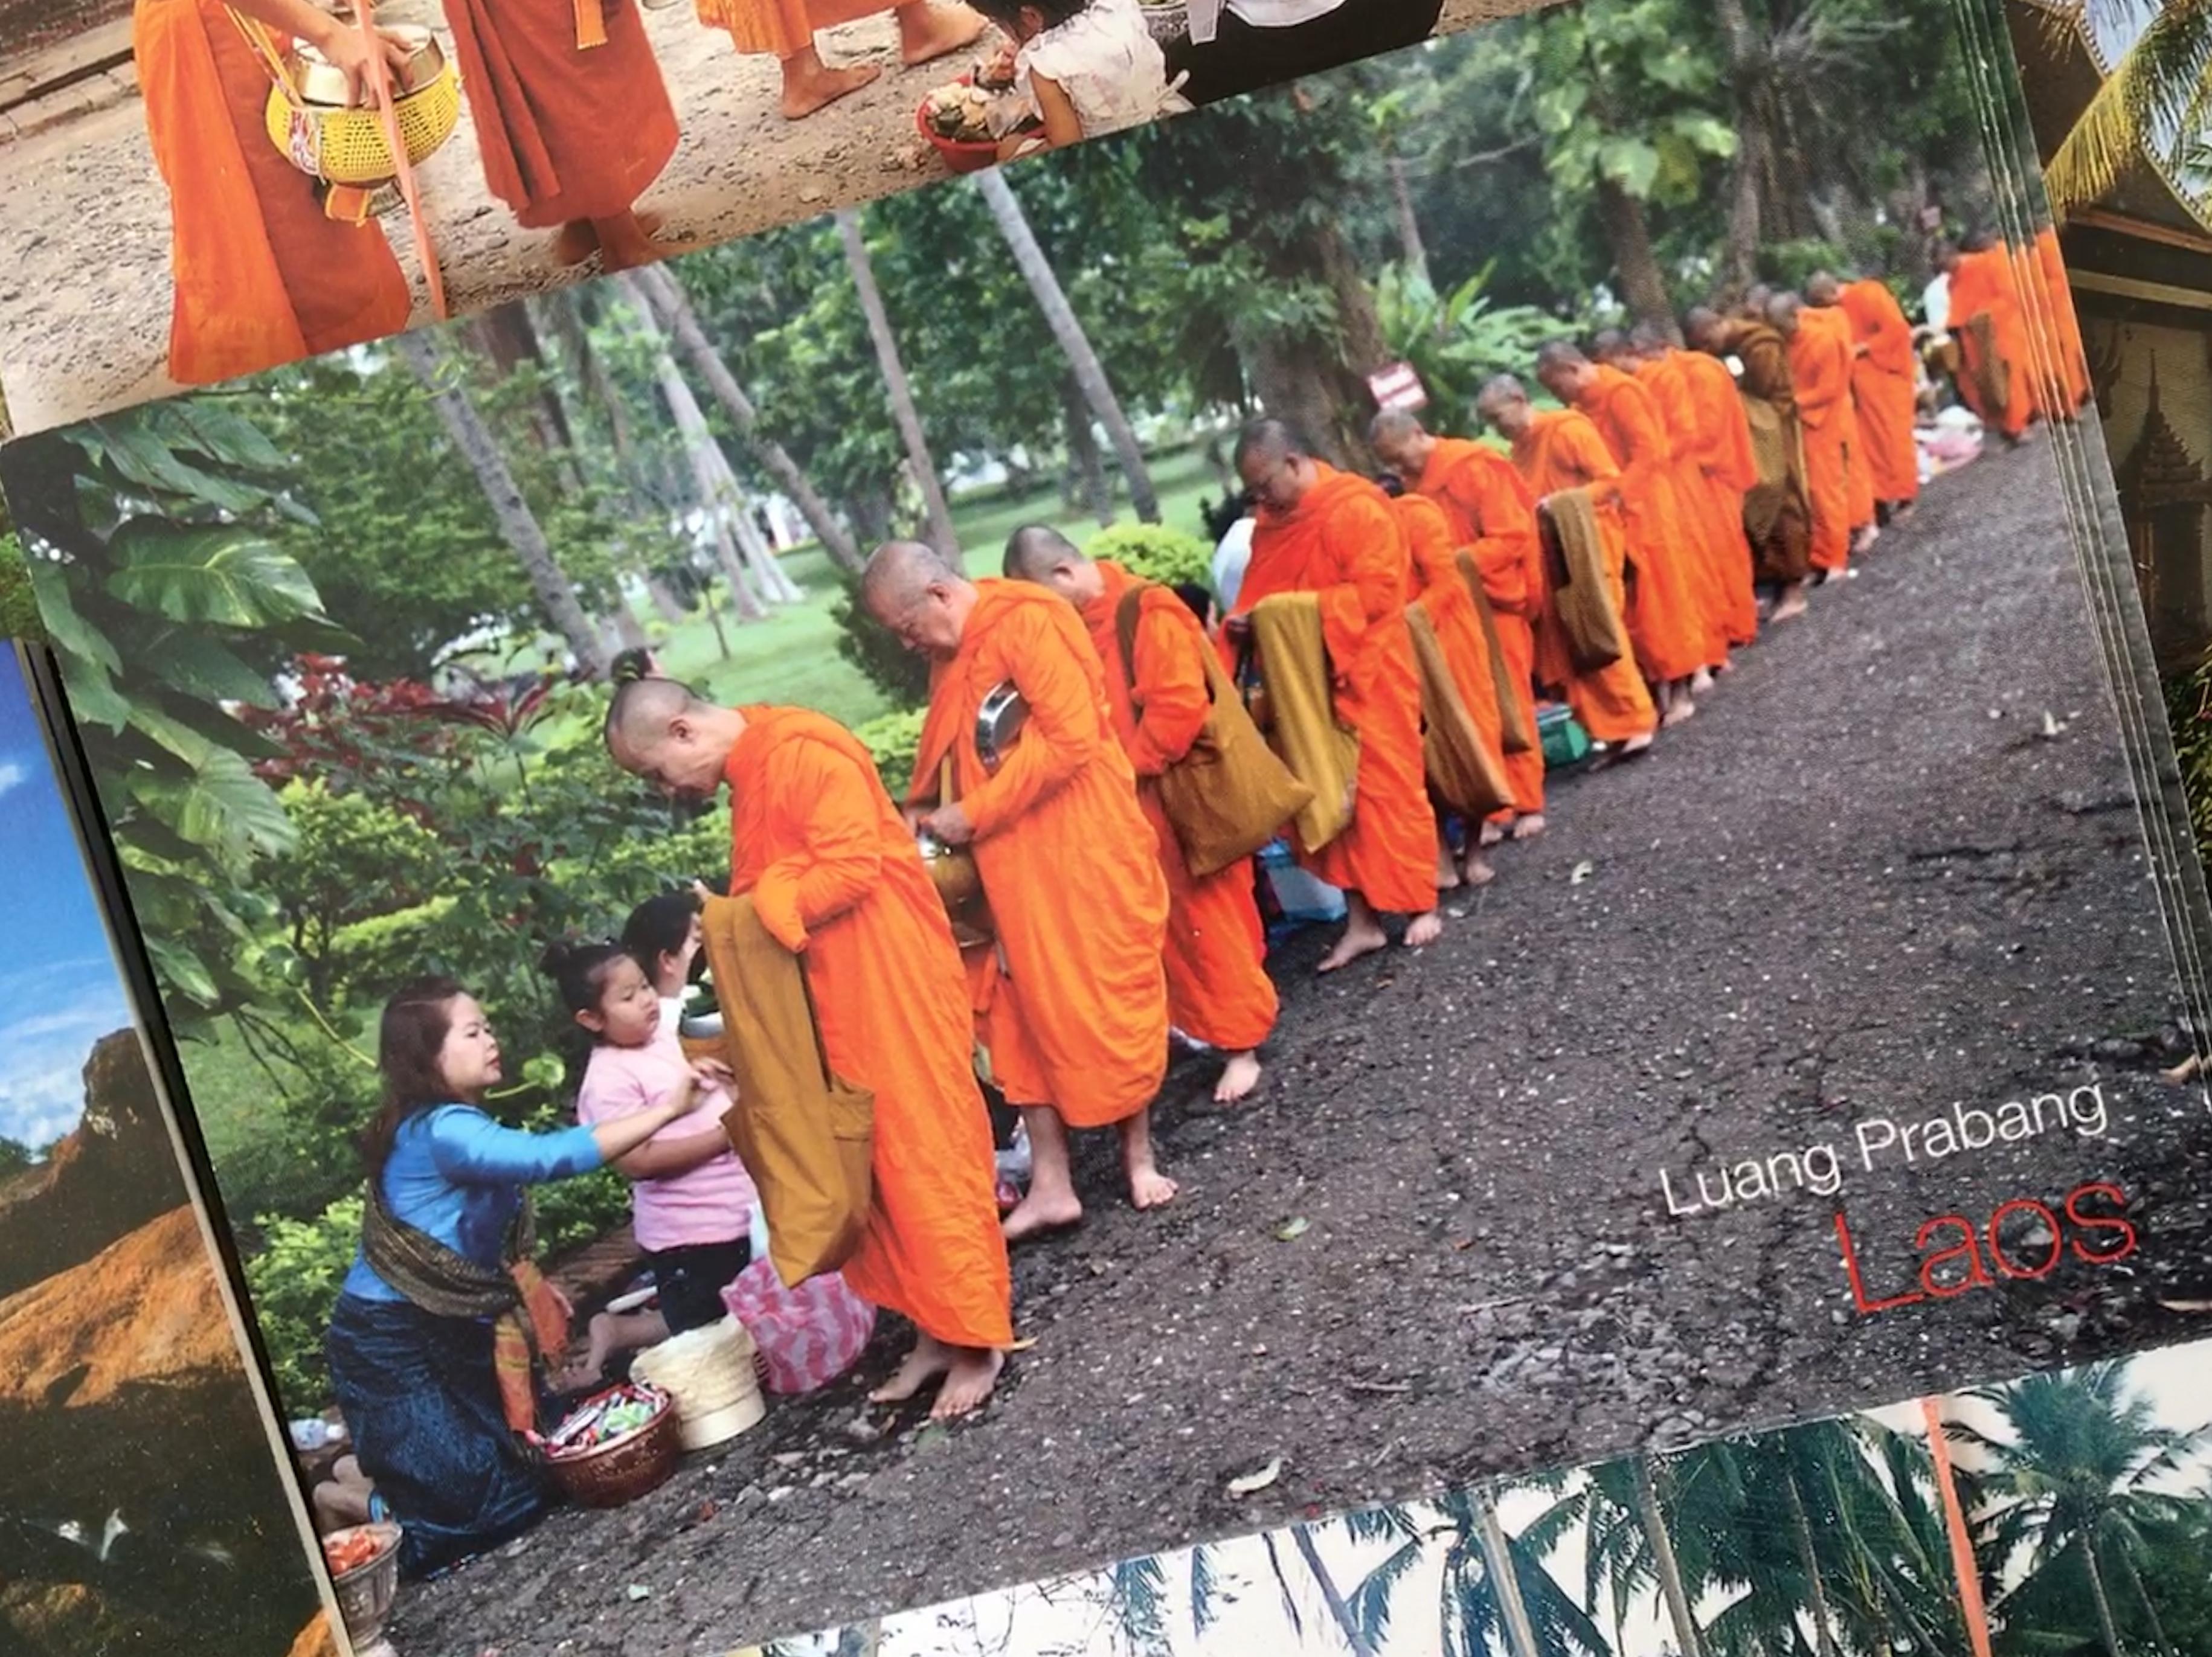 Geschenke an Mönche in Luang Prabang: für den Müll